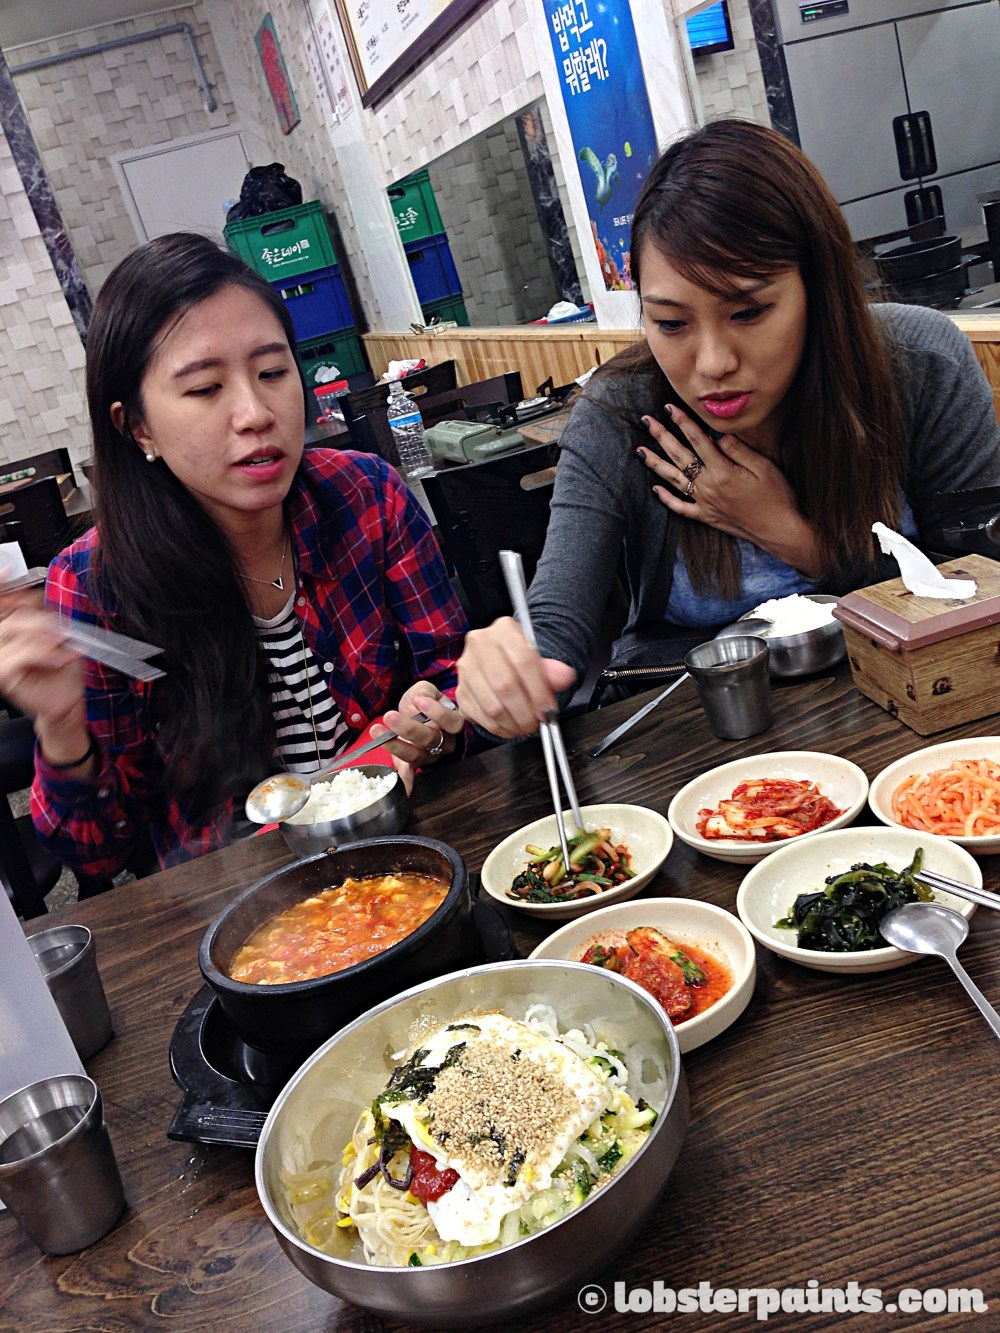 26 Sep 2014: Dinner at Mummy's Hands 엄마손식당 near Gwangan Beach | Busan, South Korea